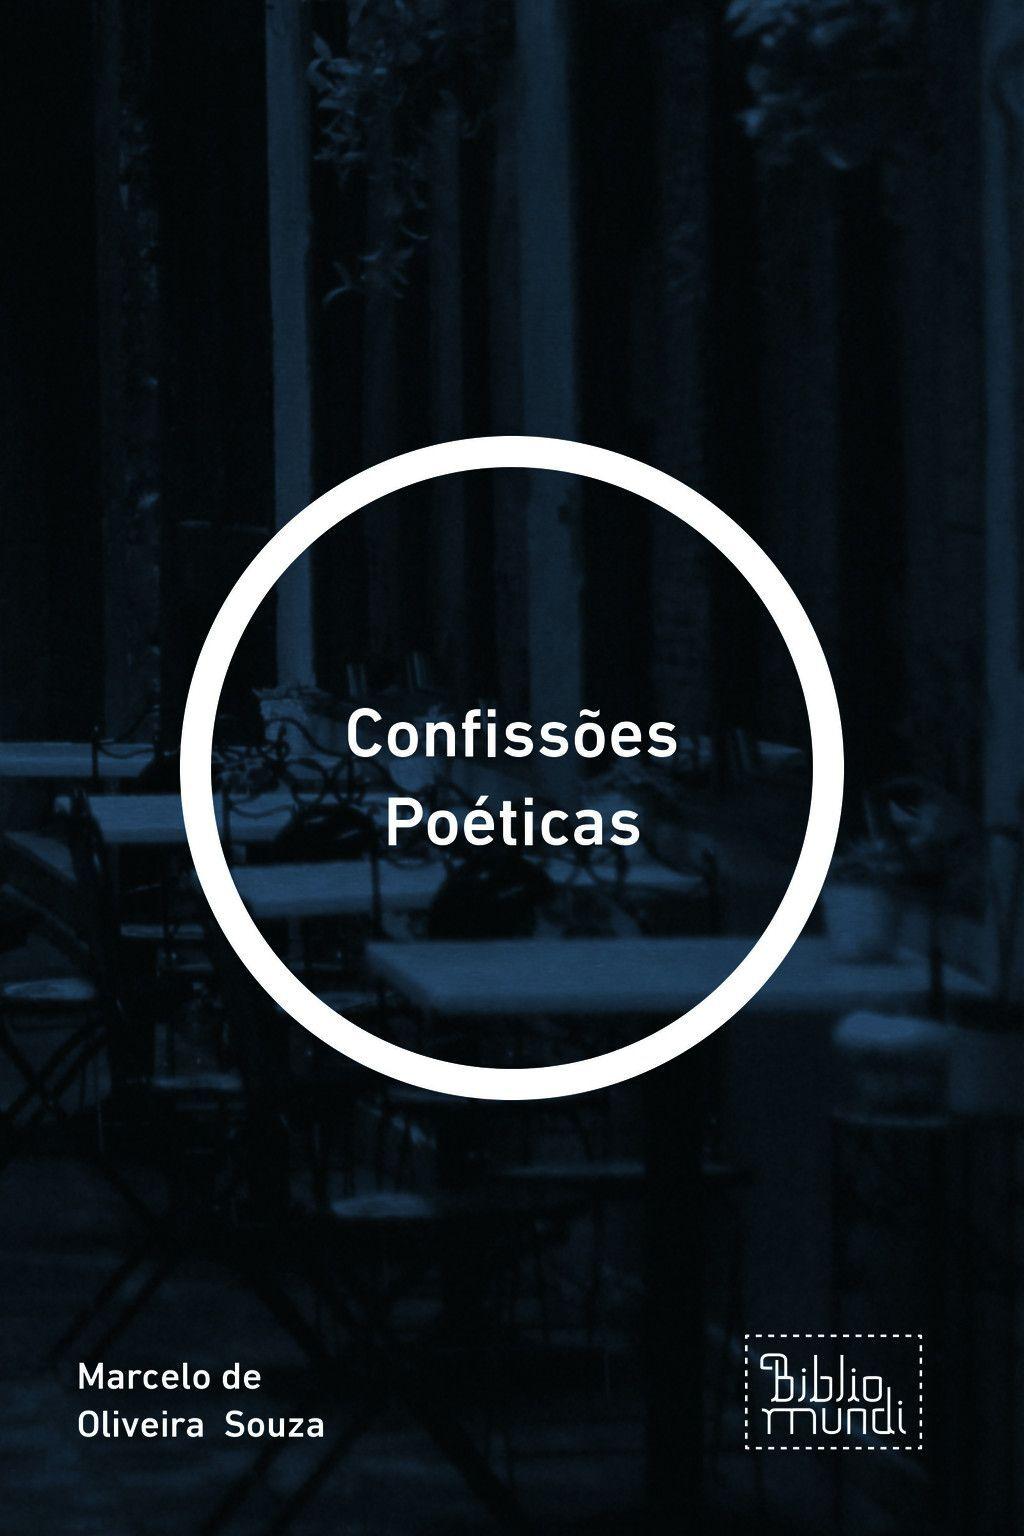 Confissões Poéticas